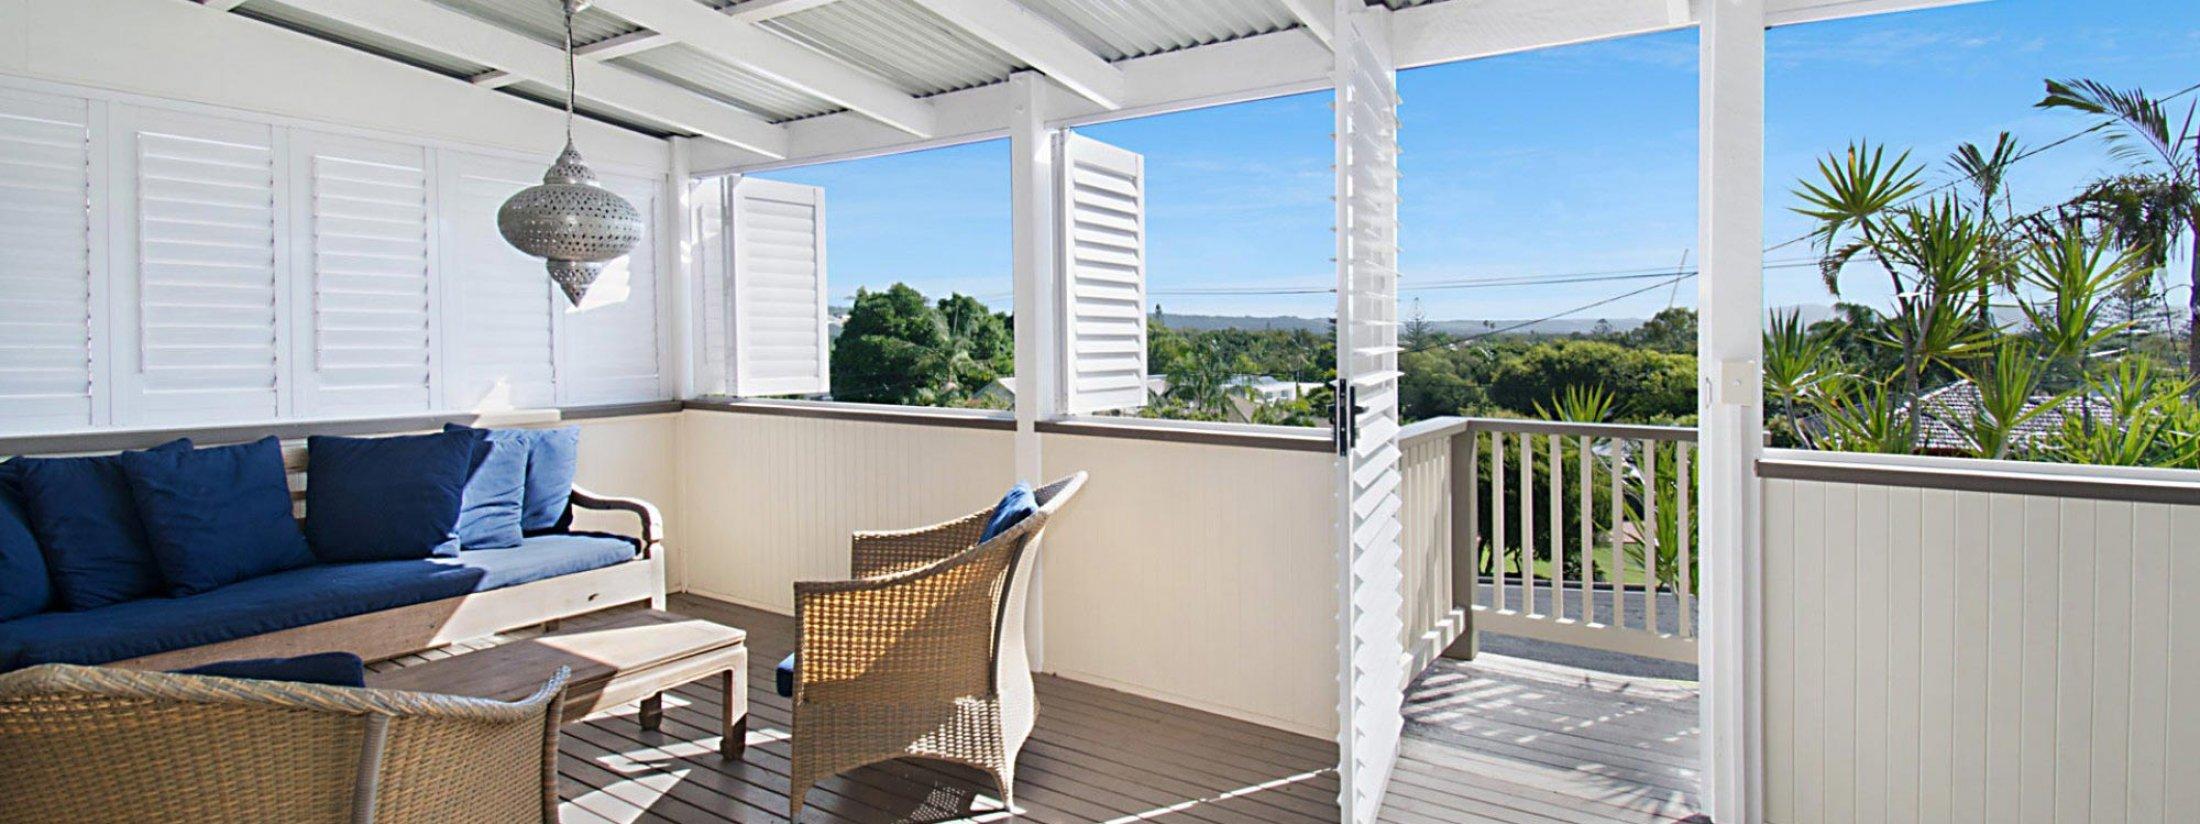 Byron View - Clarkes Beach - Front Deck West